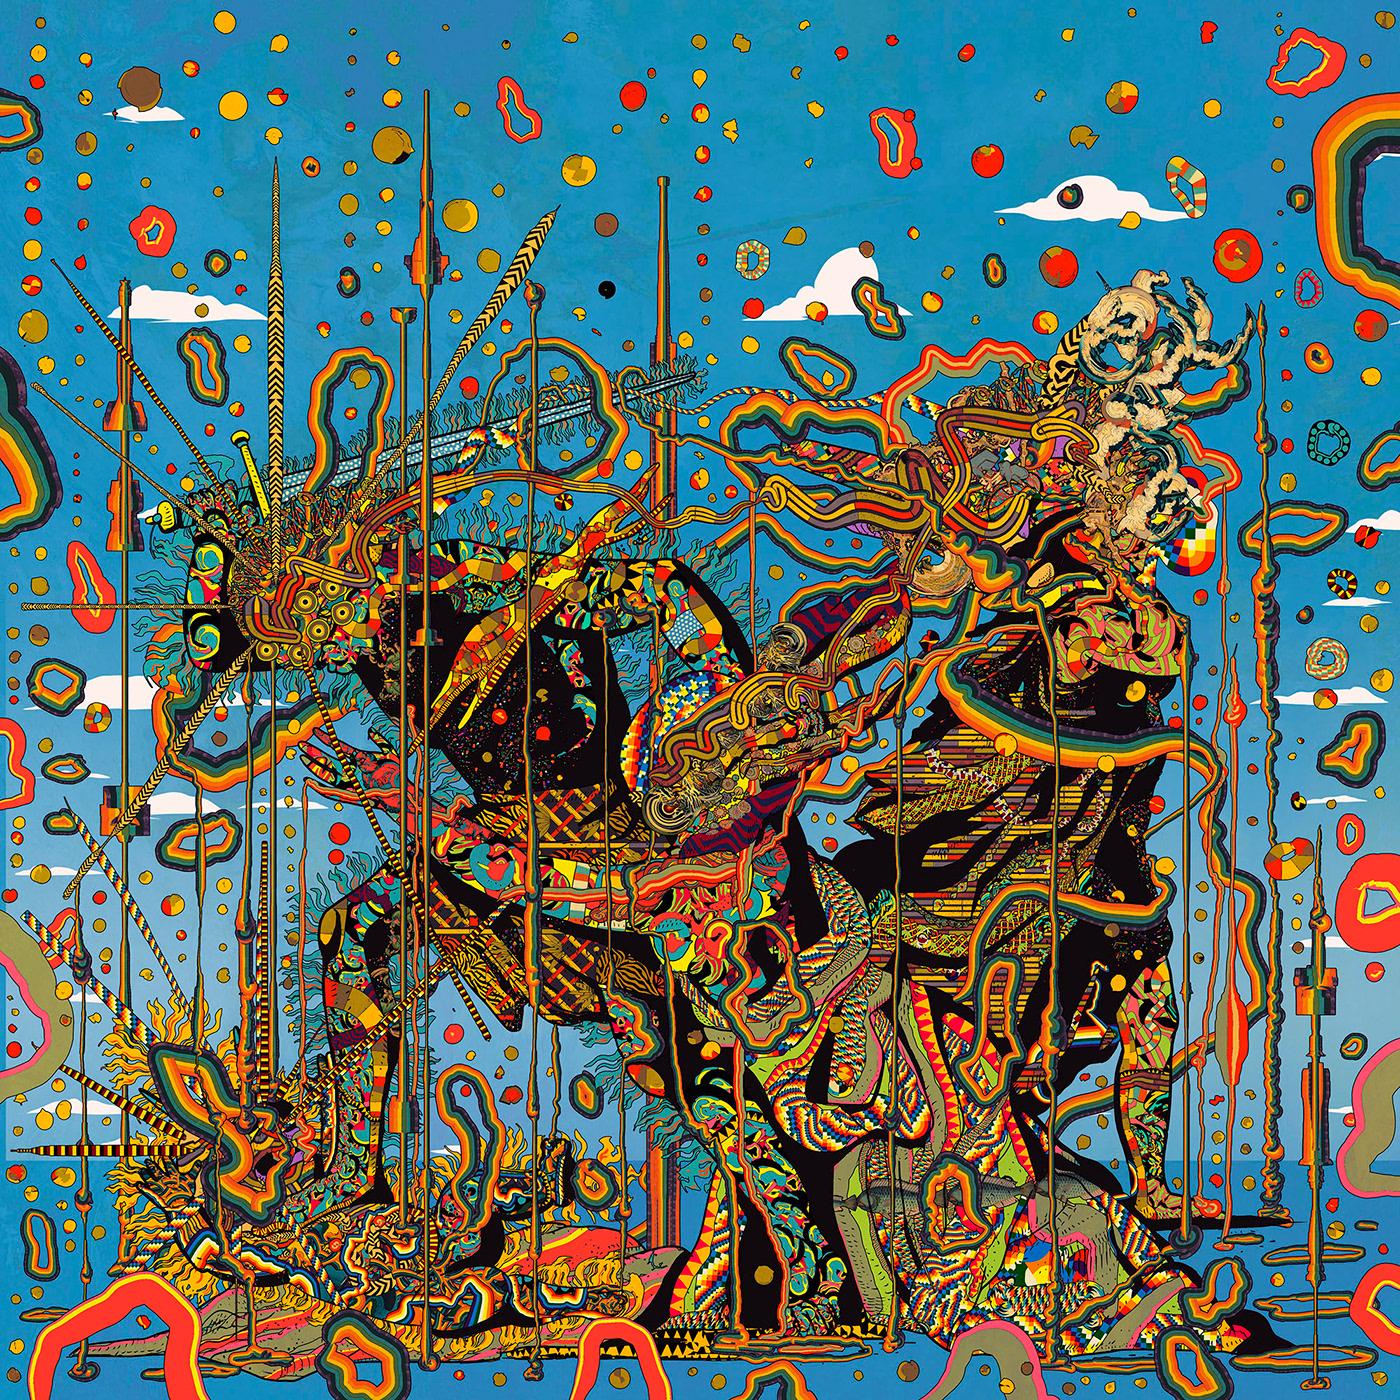 album cover art art print colorful Digital Art  ILLUSTRATION  Pop Art pop surrealism psychedelic art surrealism